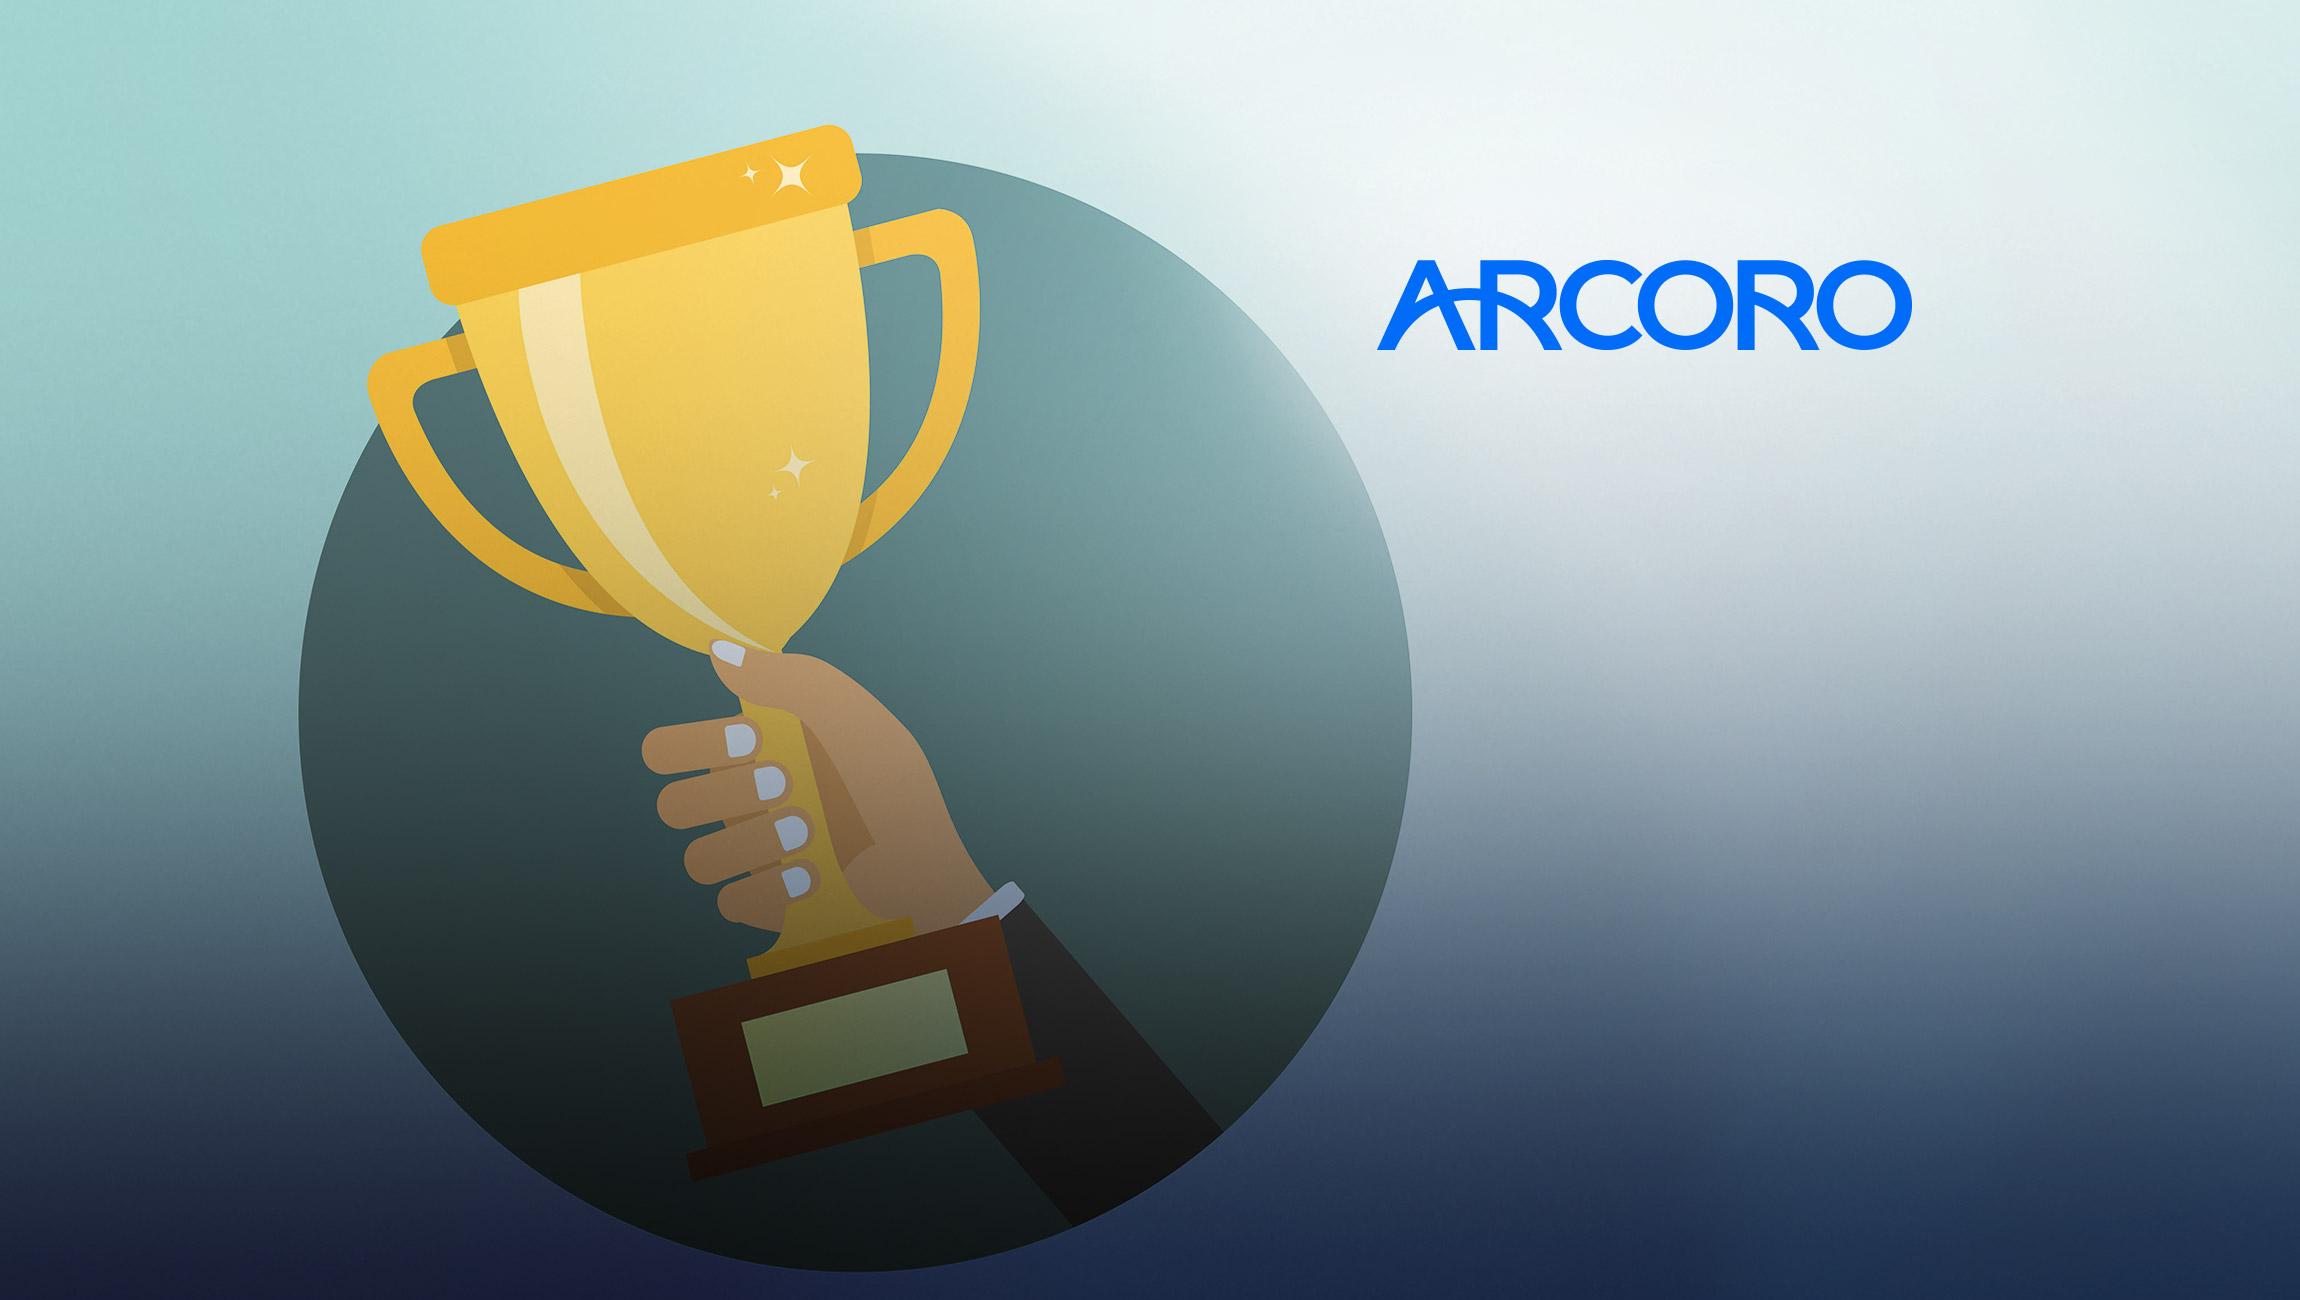 Arcoro Wins Two 2021 Stevie Awards